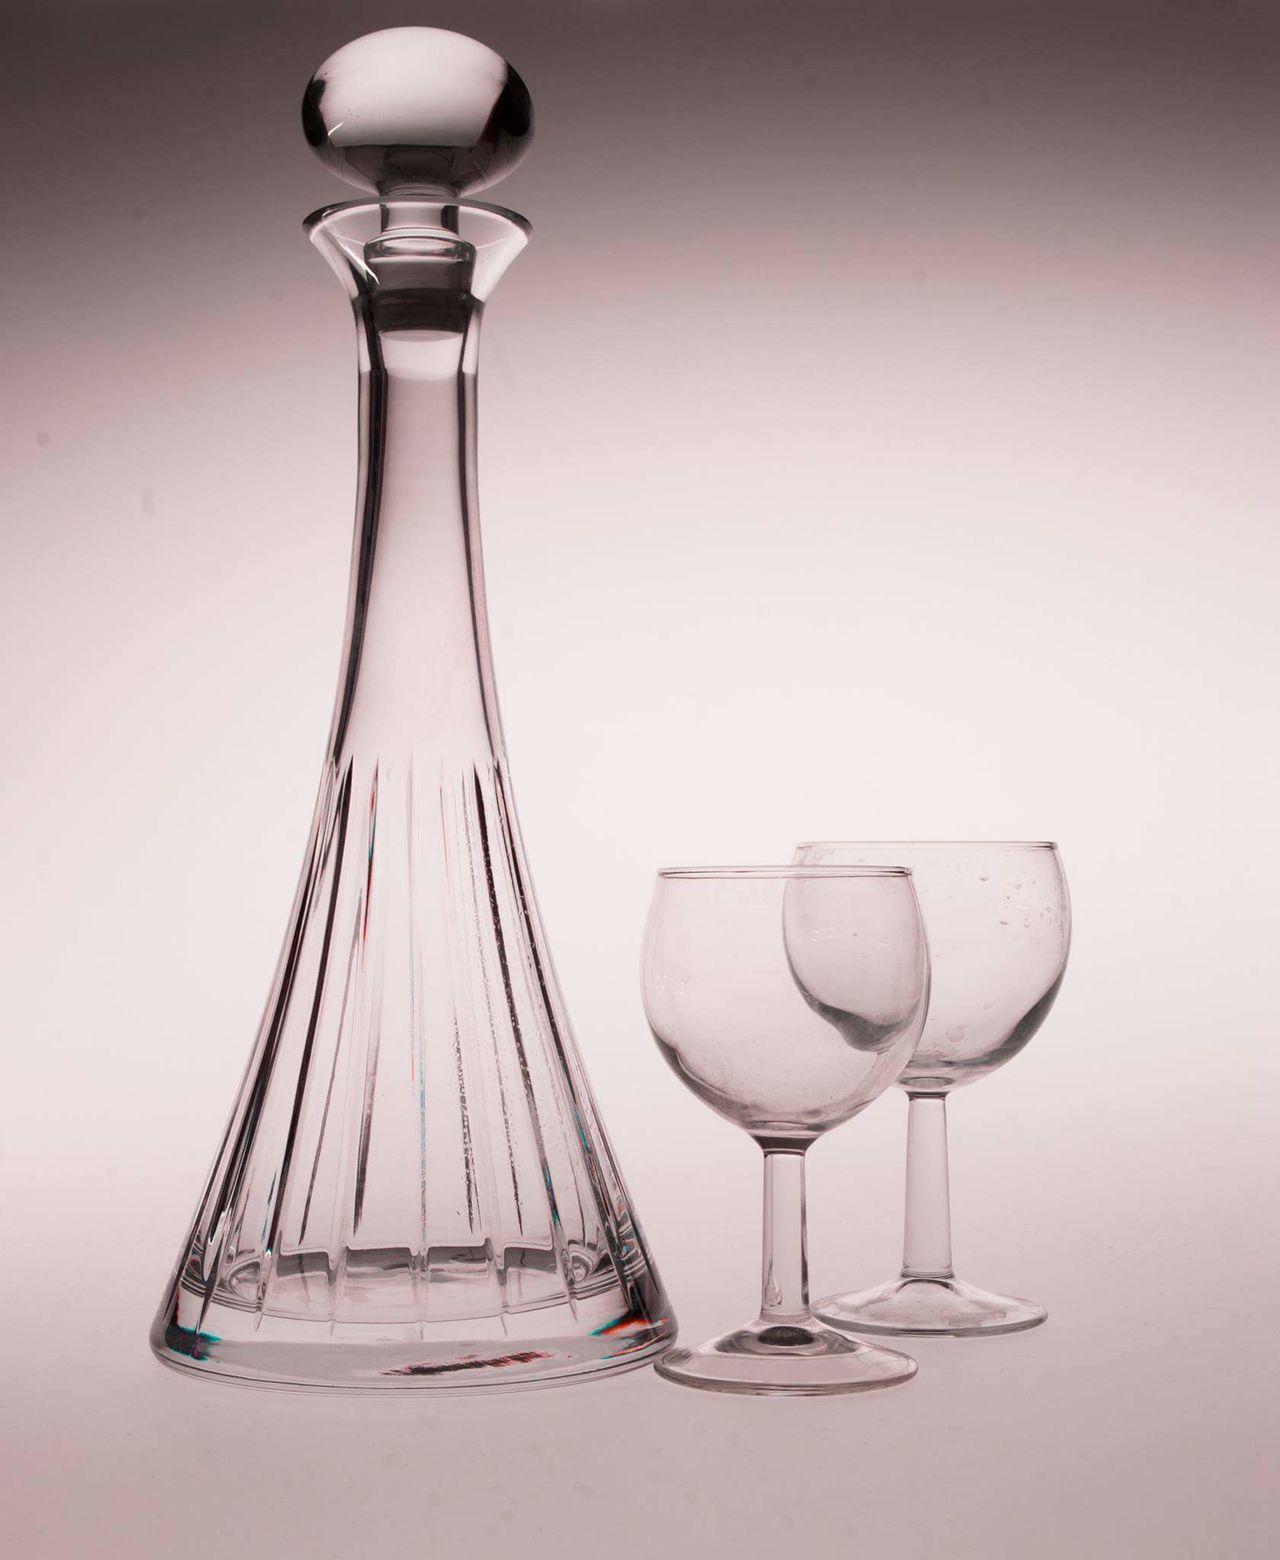 Close-up No People White Glass Reflection Glass Art Glass Objects  Glassware Glass Bottle Glass Of Wine Studio Studio Shot Studio Photography Student Studio Shoot